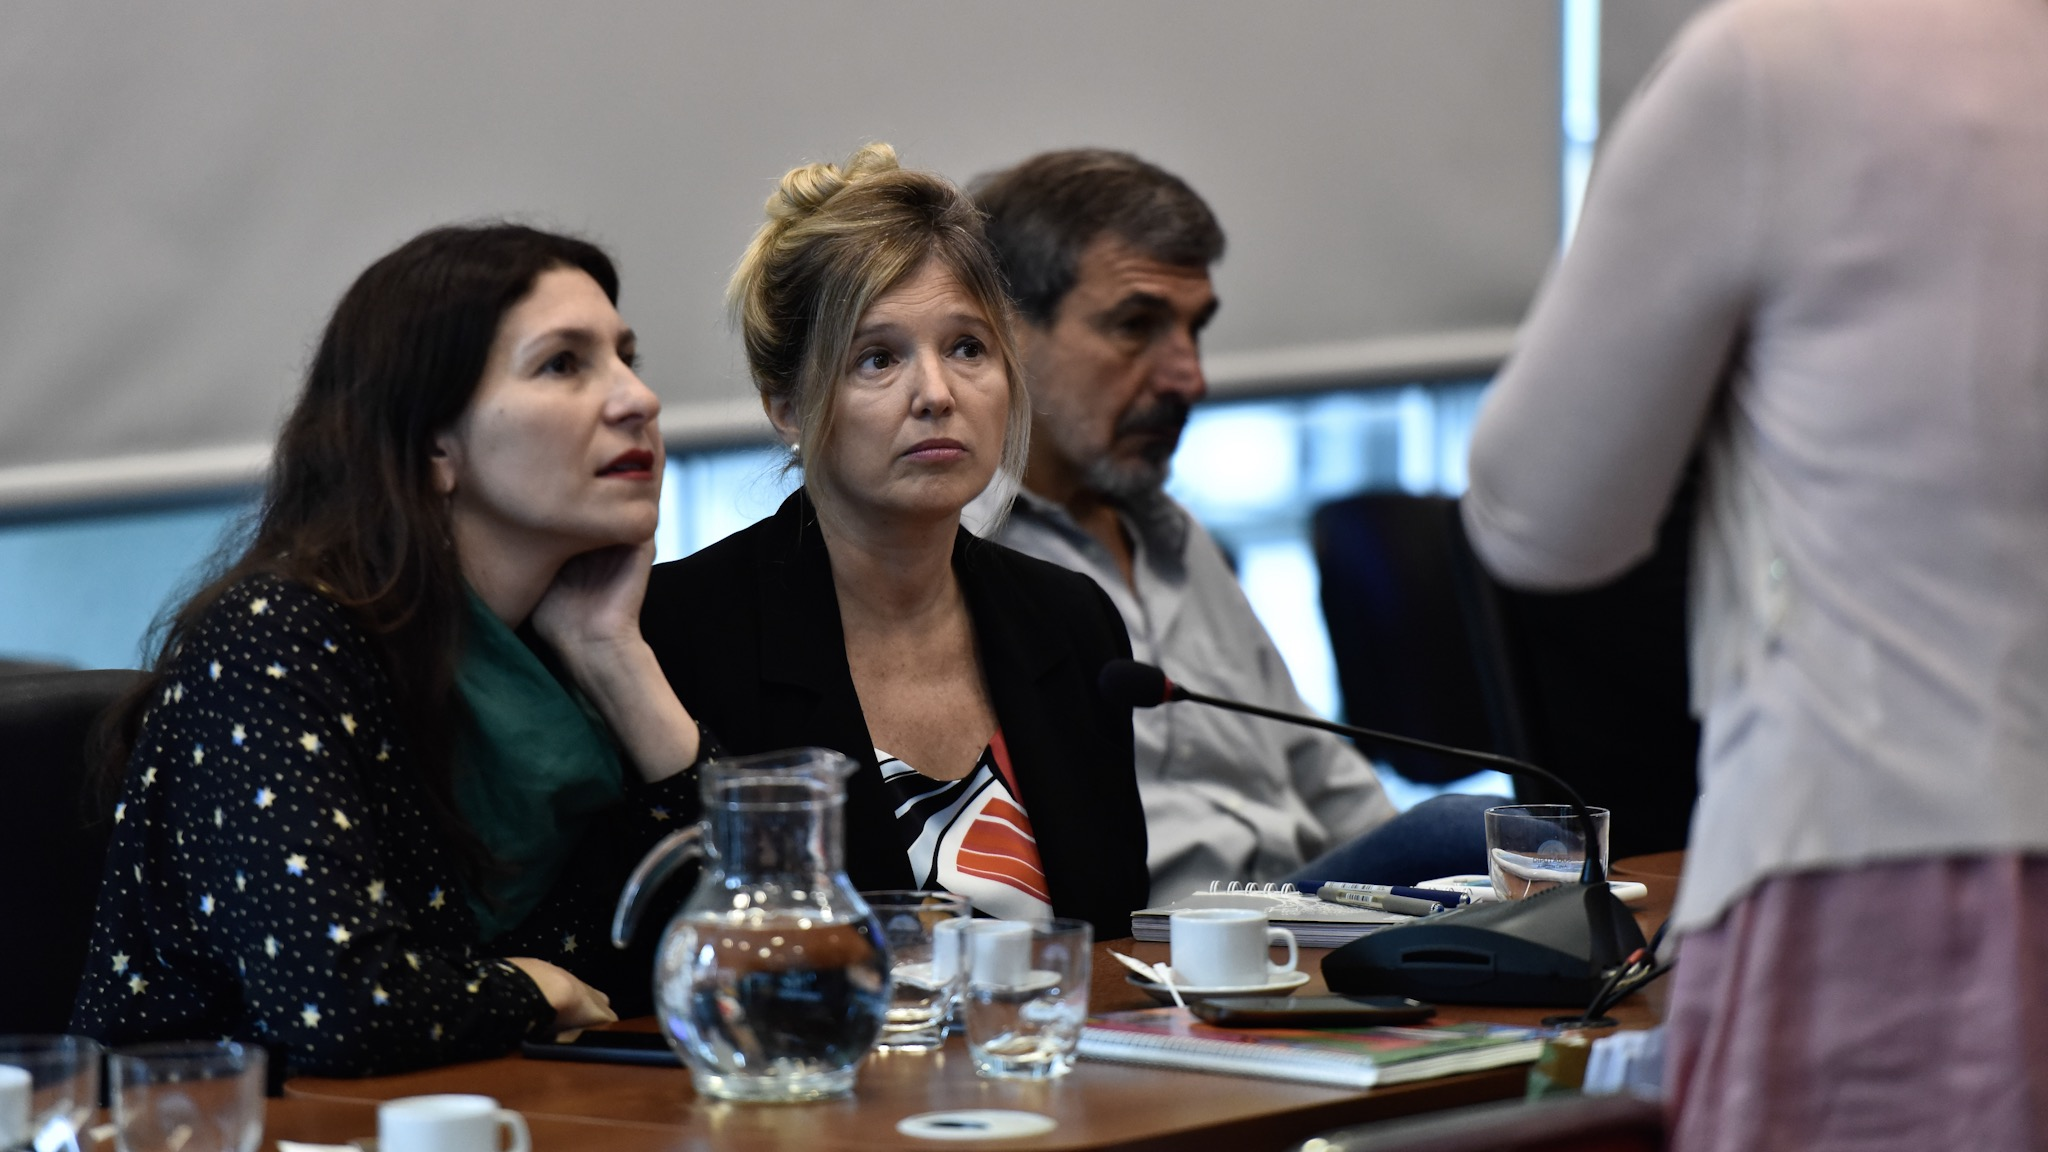 La diputada nacional Cristina Álvarez Rodríguez